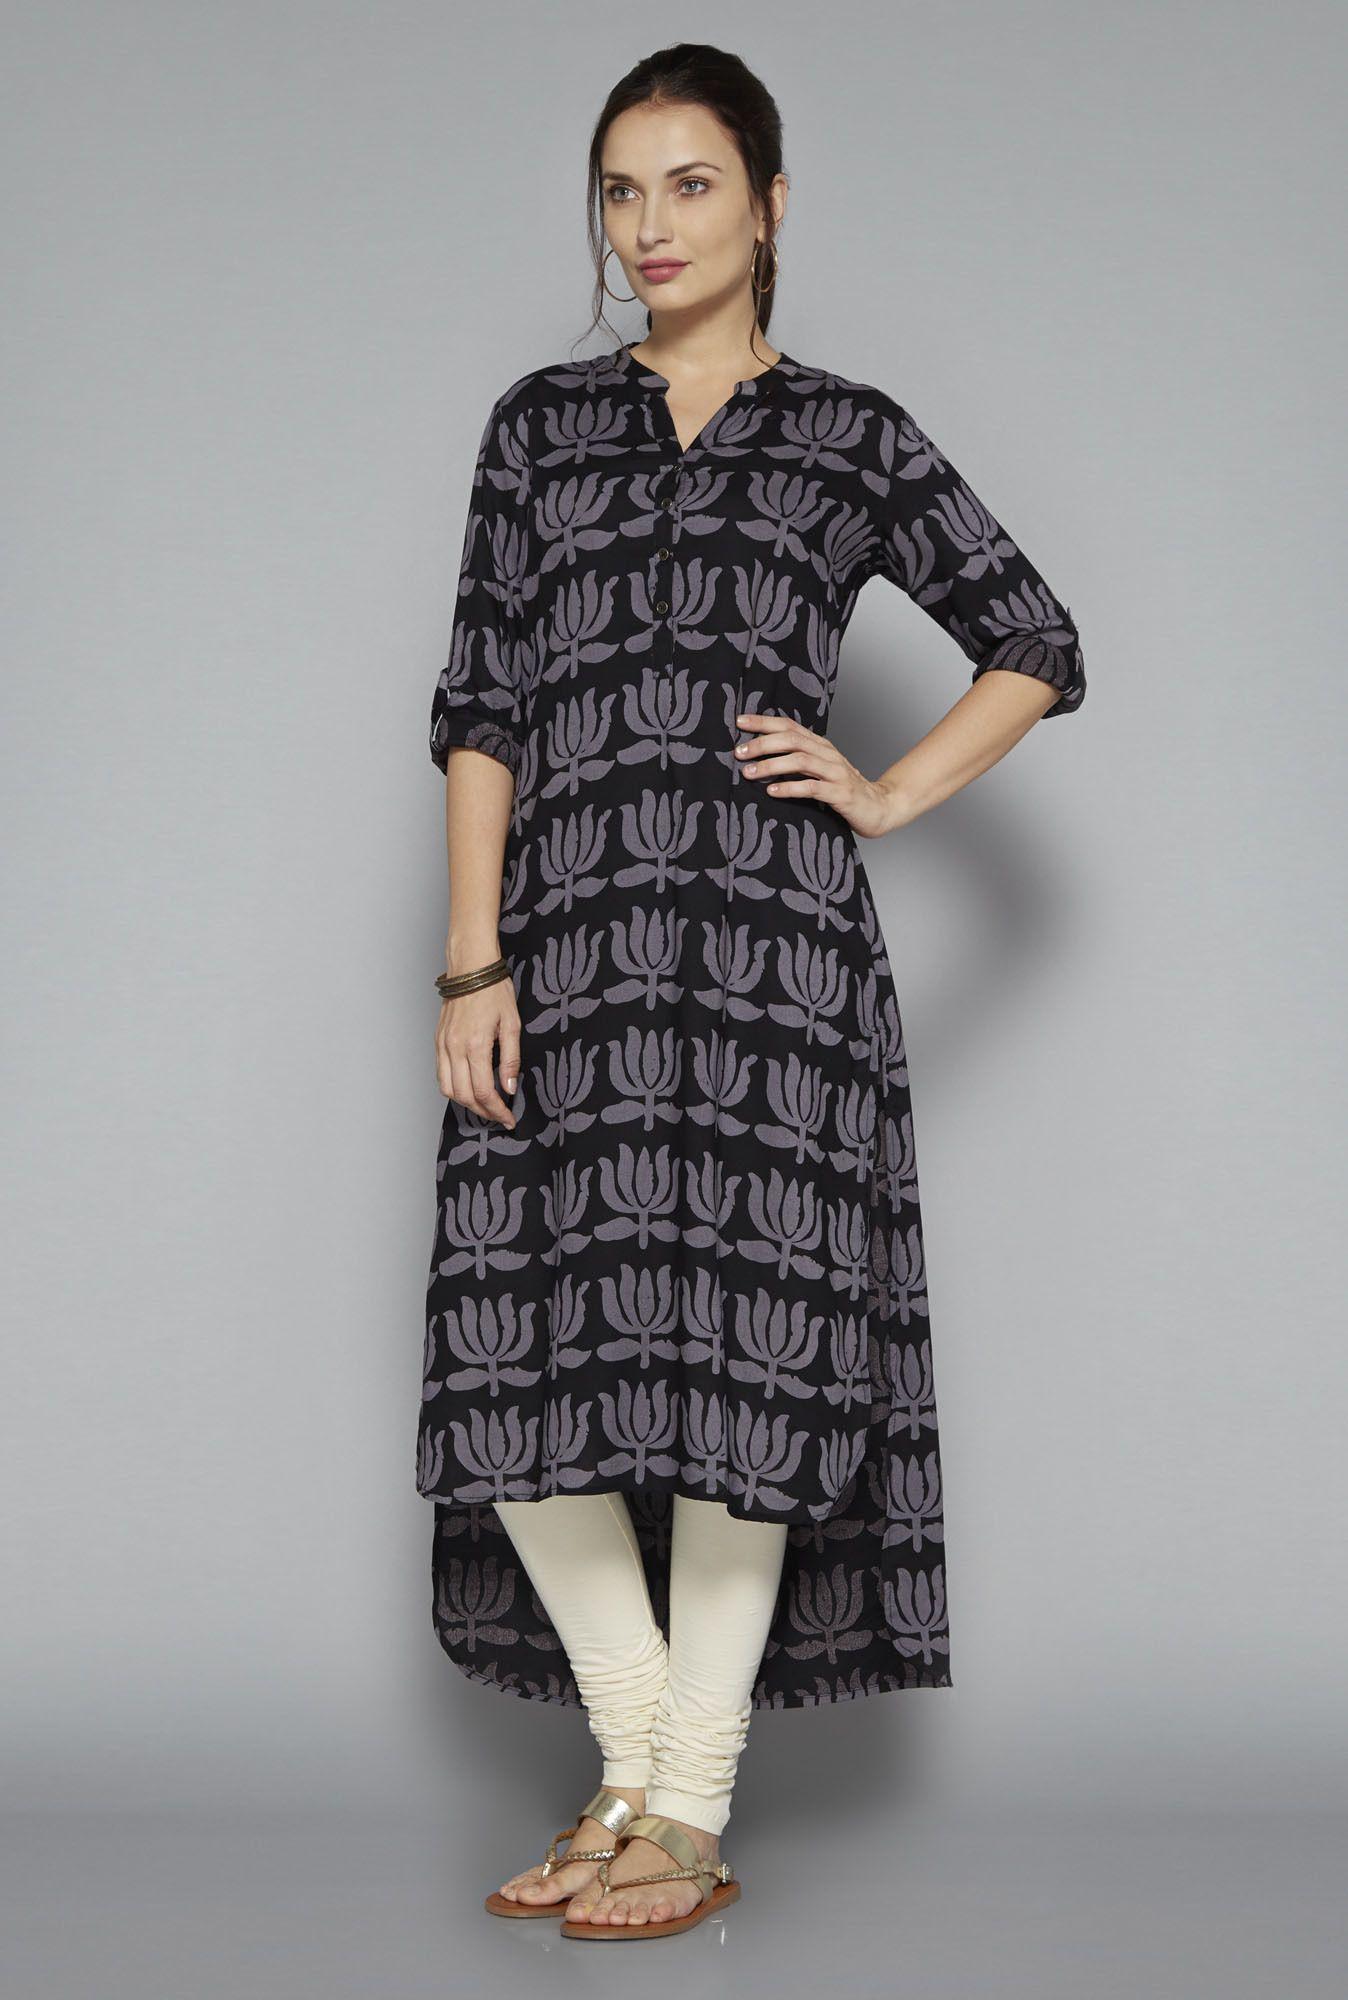 1aff66a6da Black Viscose 3/4th Sleeves Floral Print Kurta #Kurta #Black #Viscose  #3/4th Sleeves